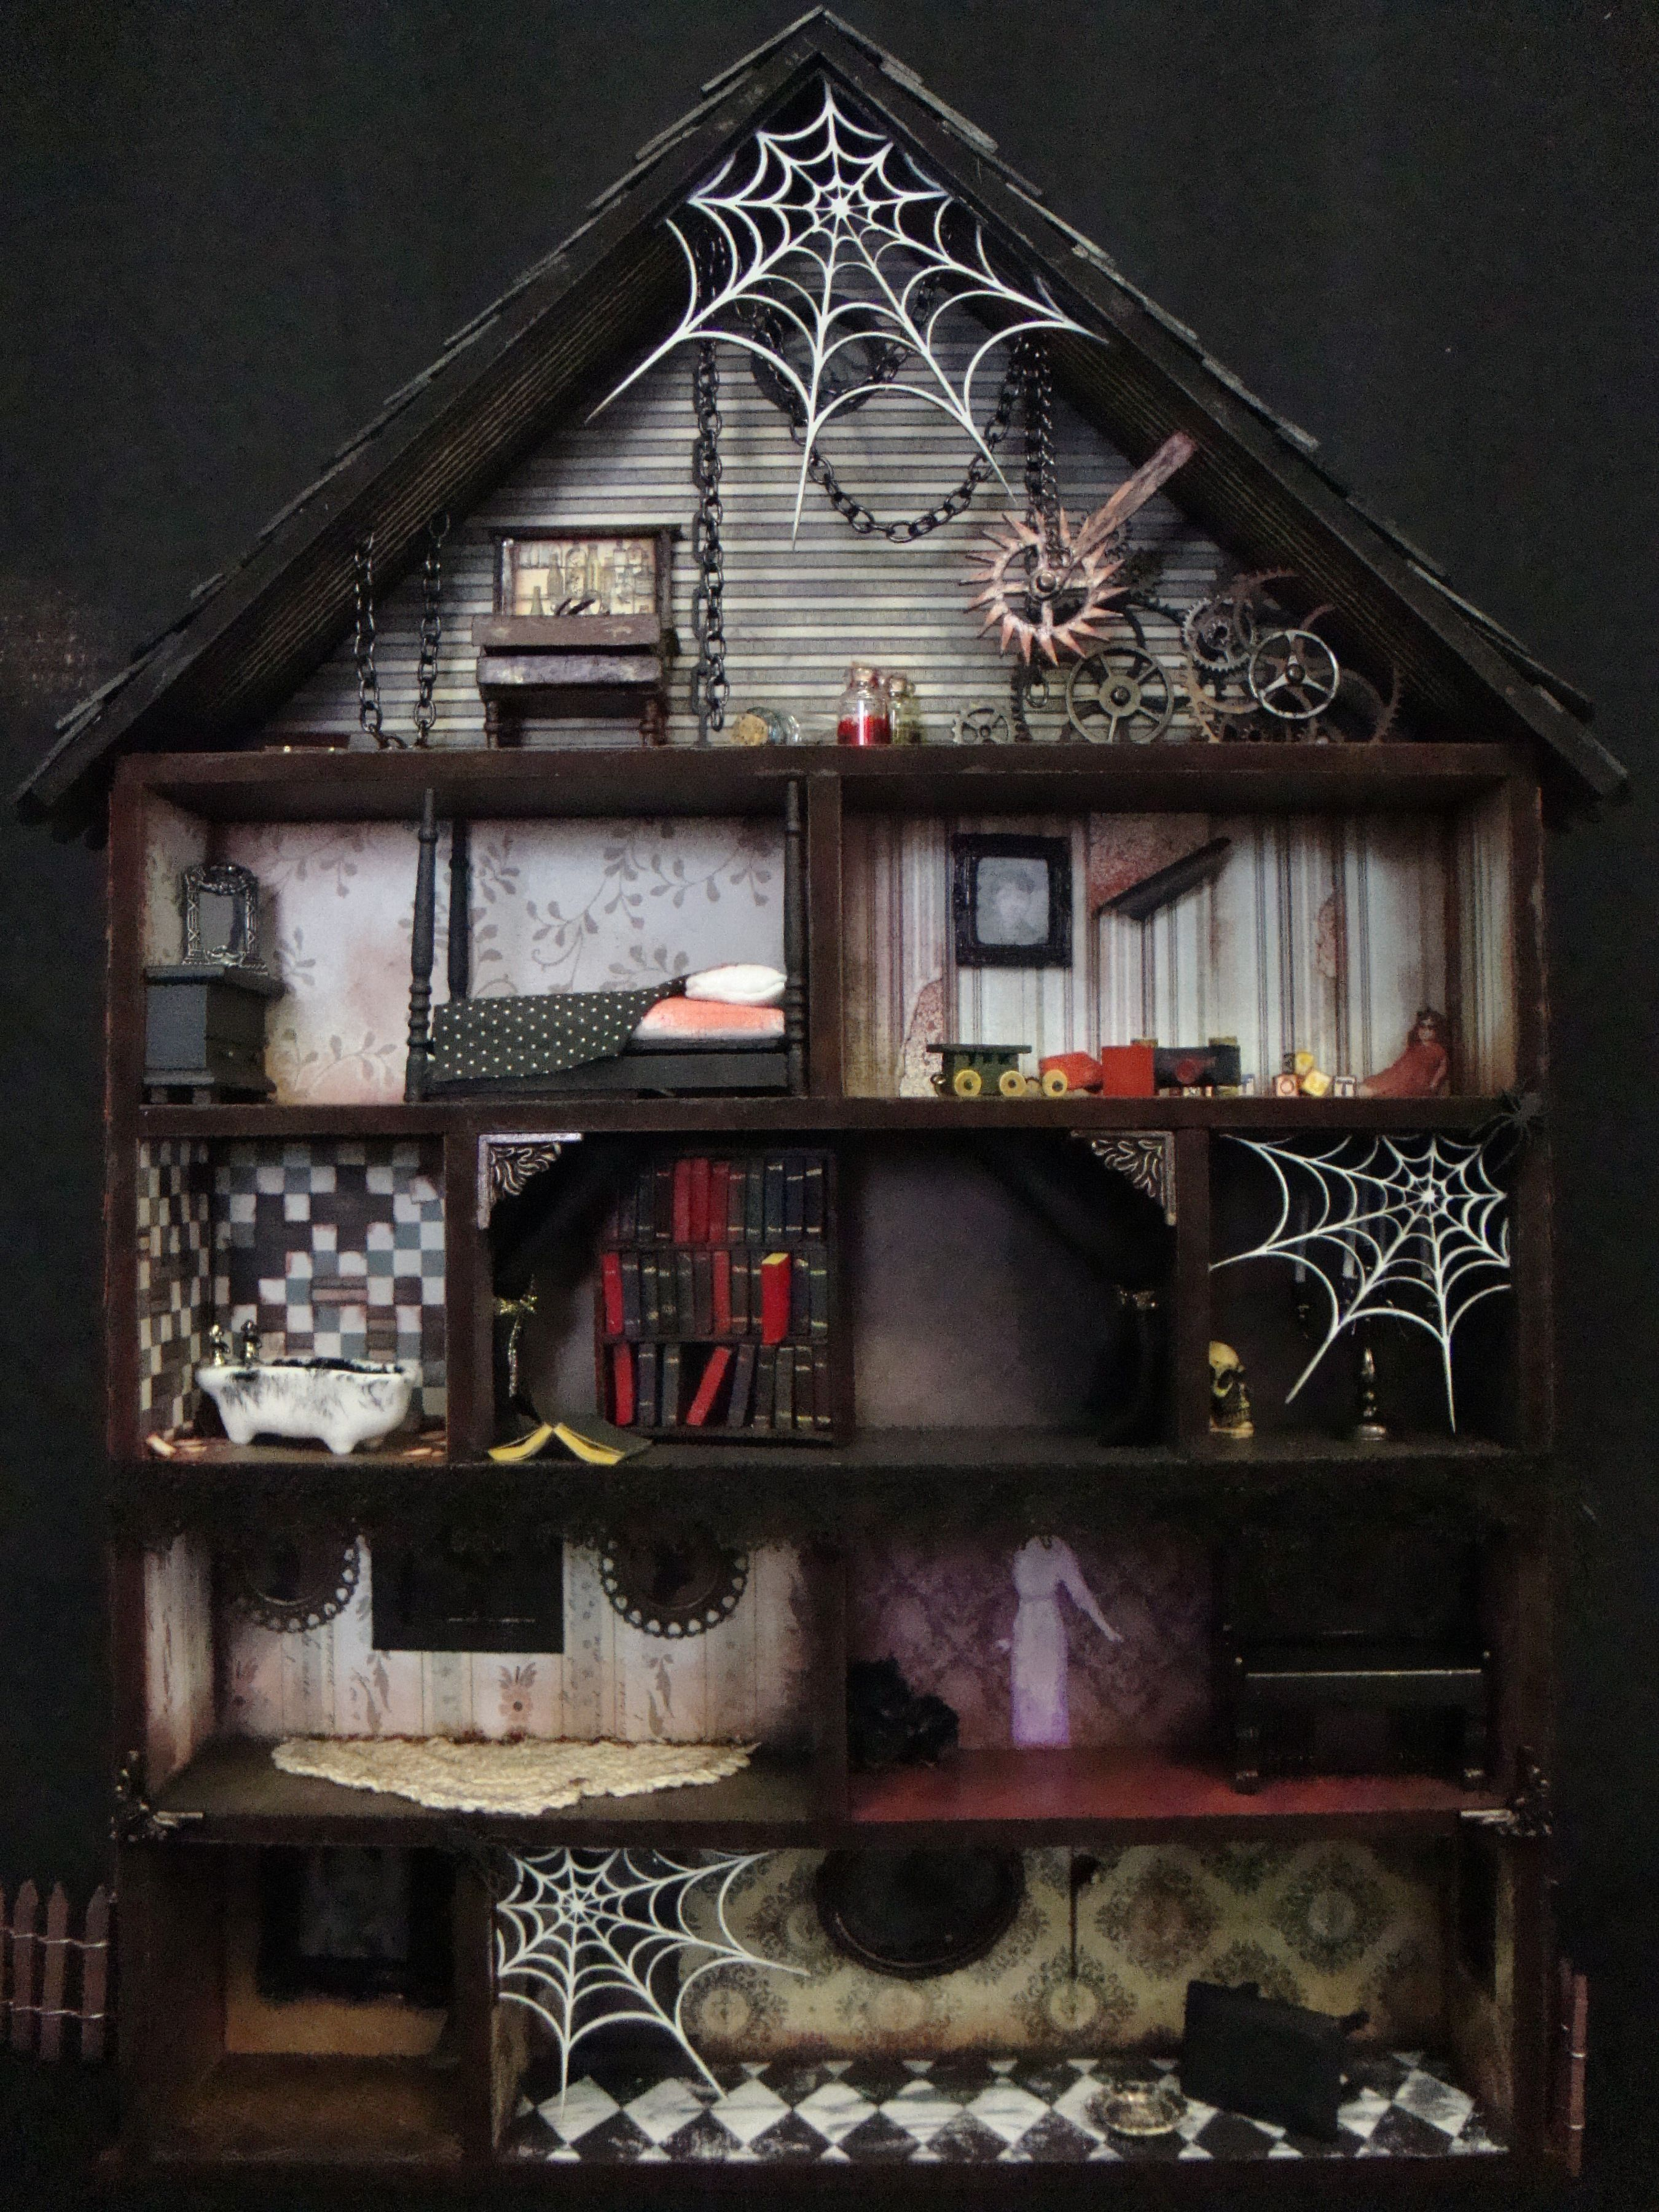 Haunted House Shadow Box Interior - Scrapbook.com UGH I LOVE THISSS #haunteddollhouse